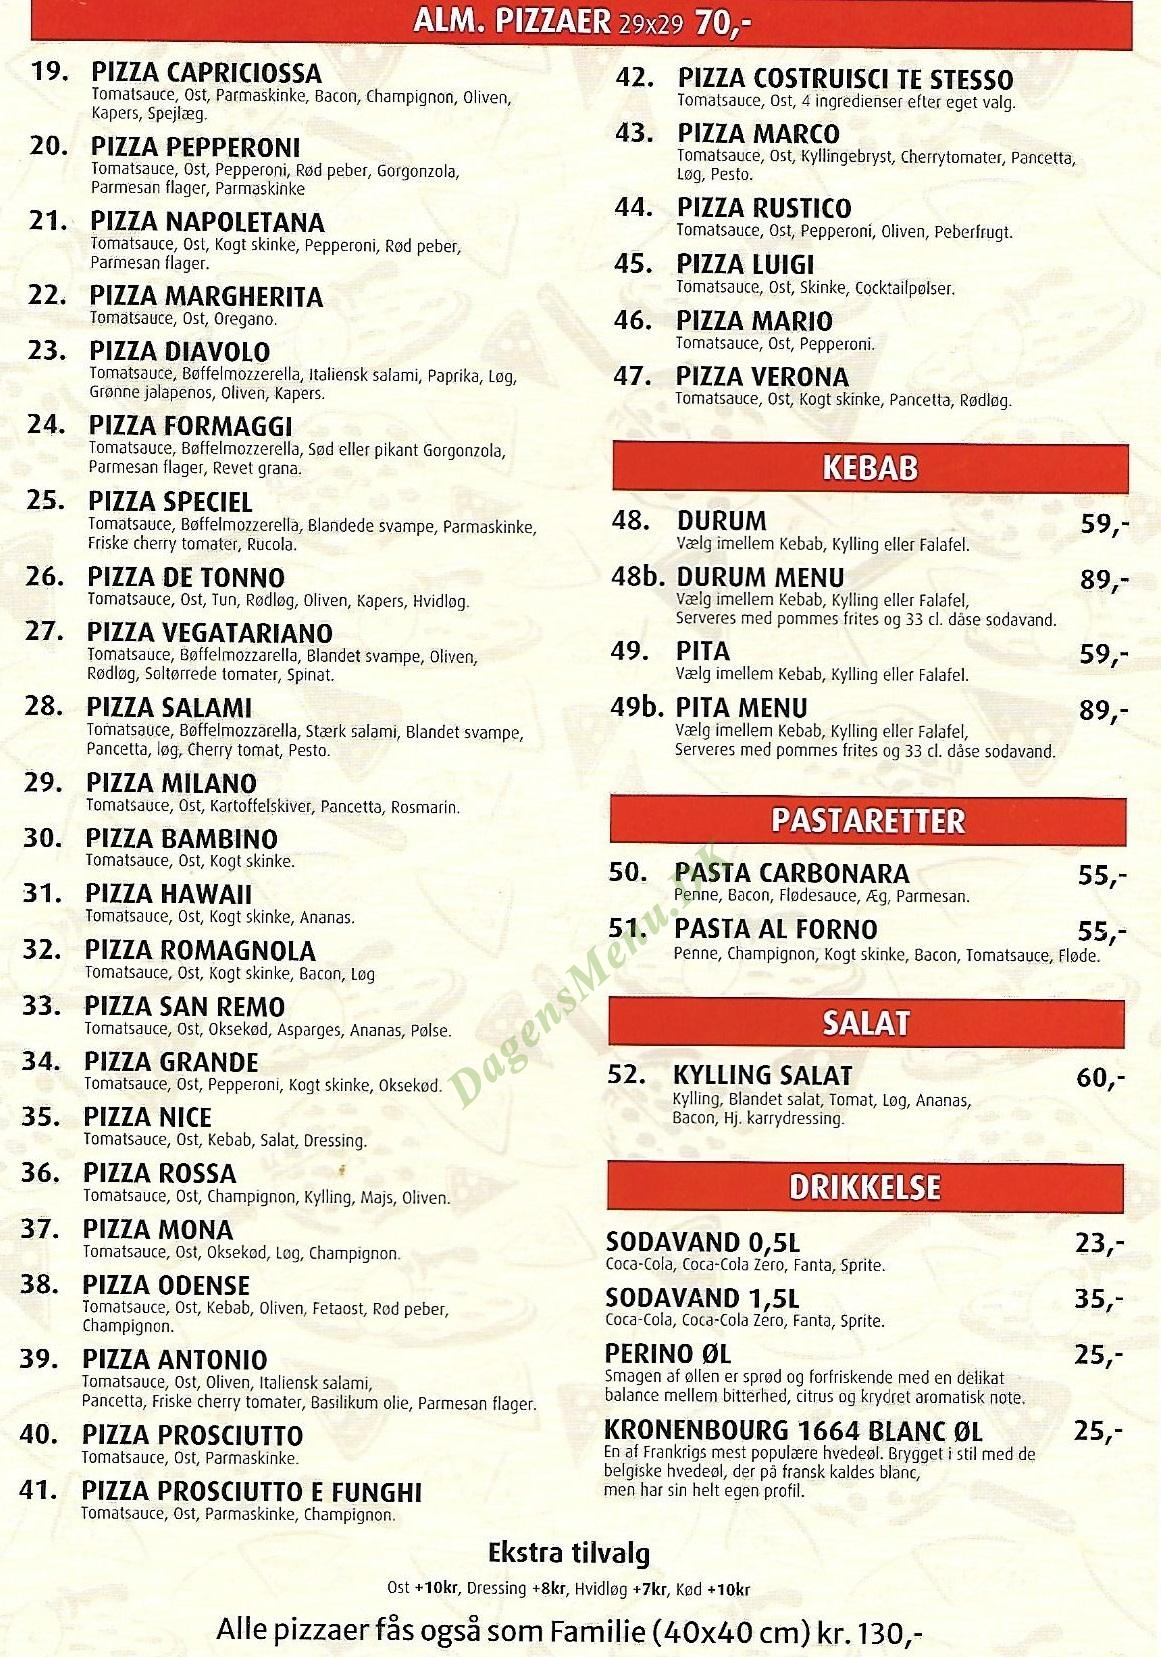 Pizza Planet Odense - Menukort